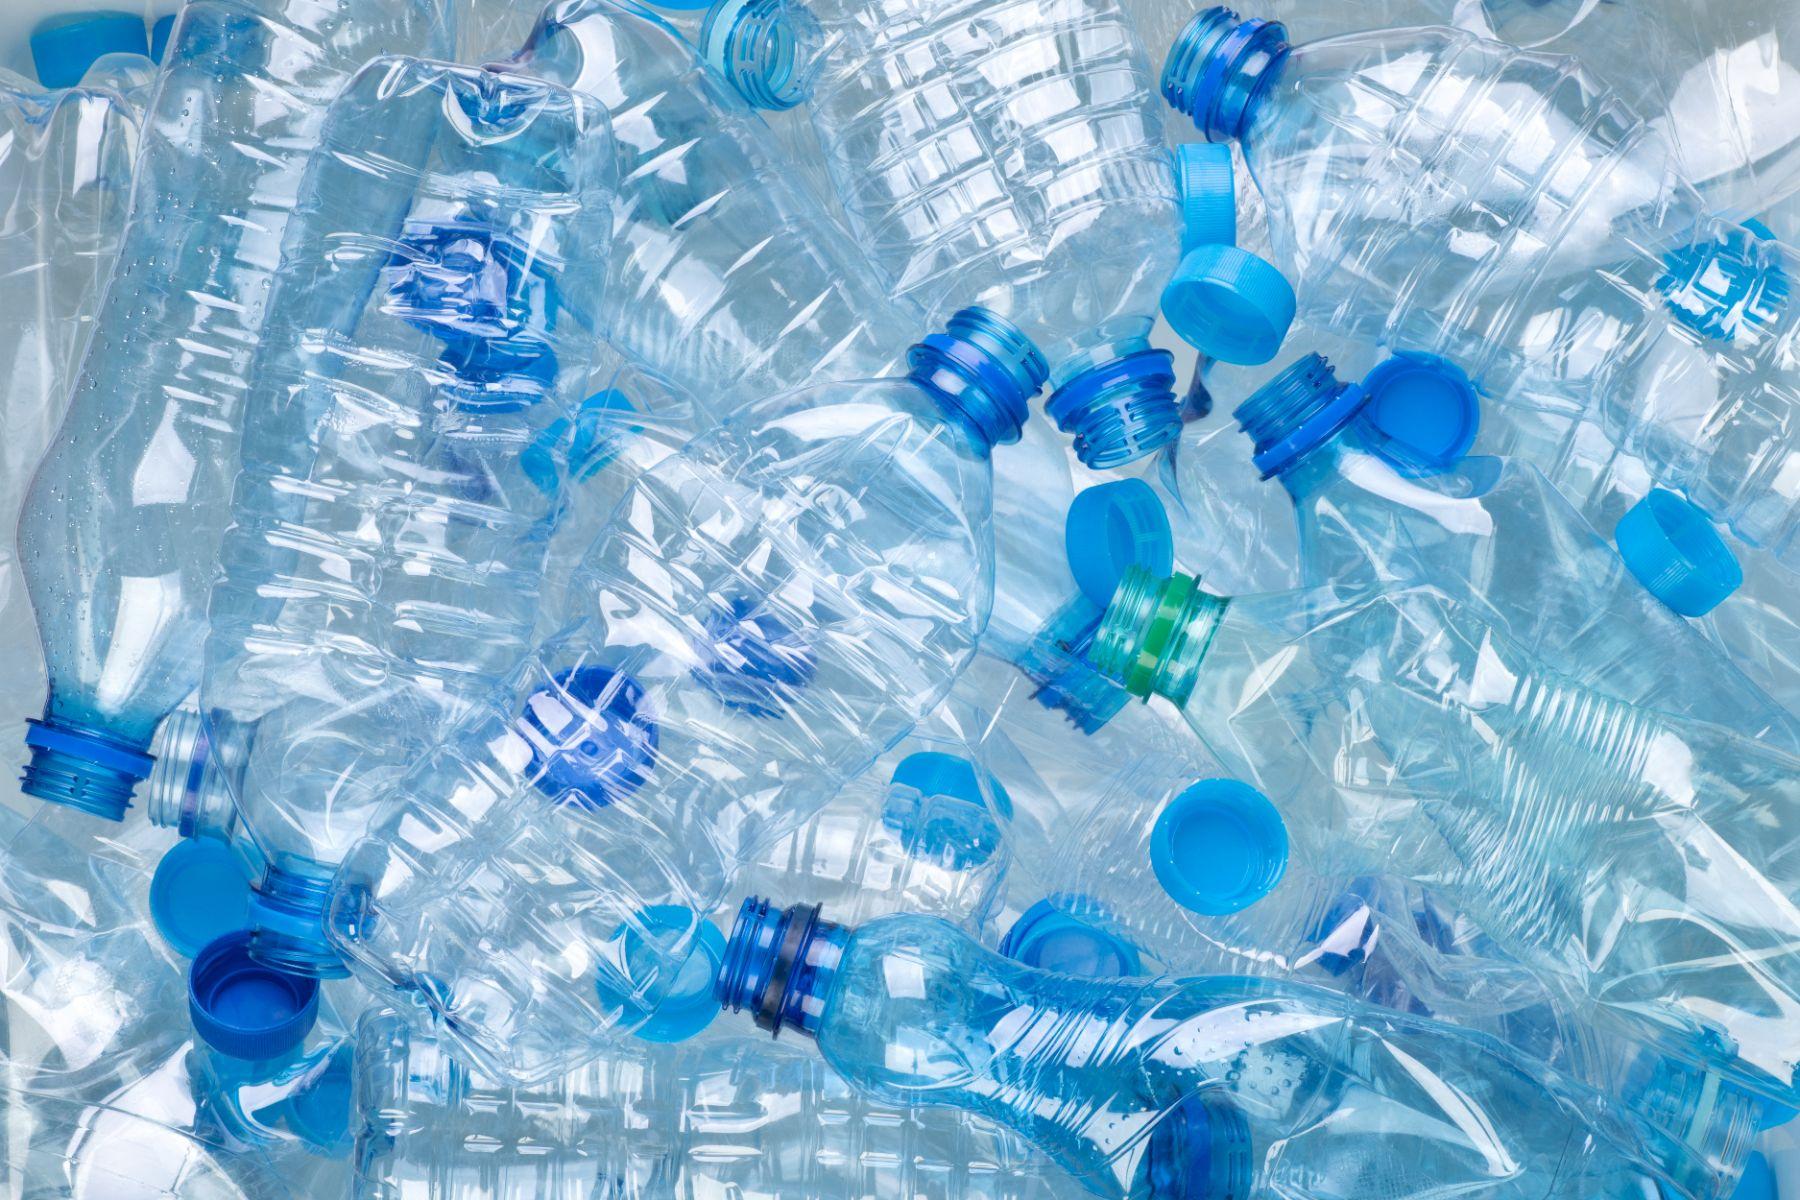 conjunto de garrafas de plastico pet amassadas